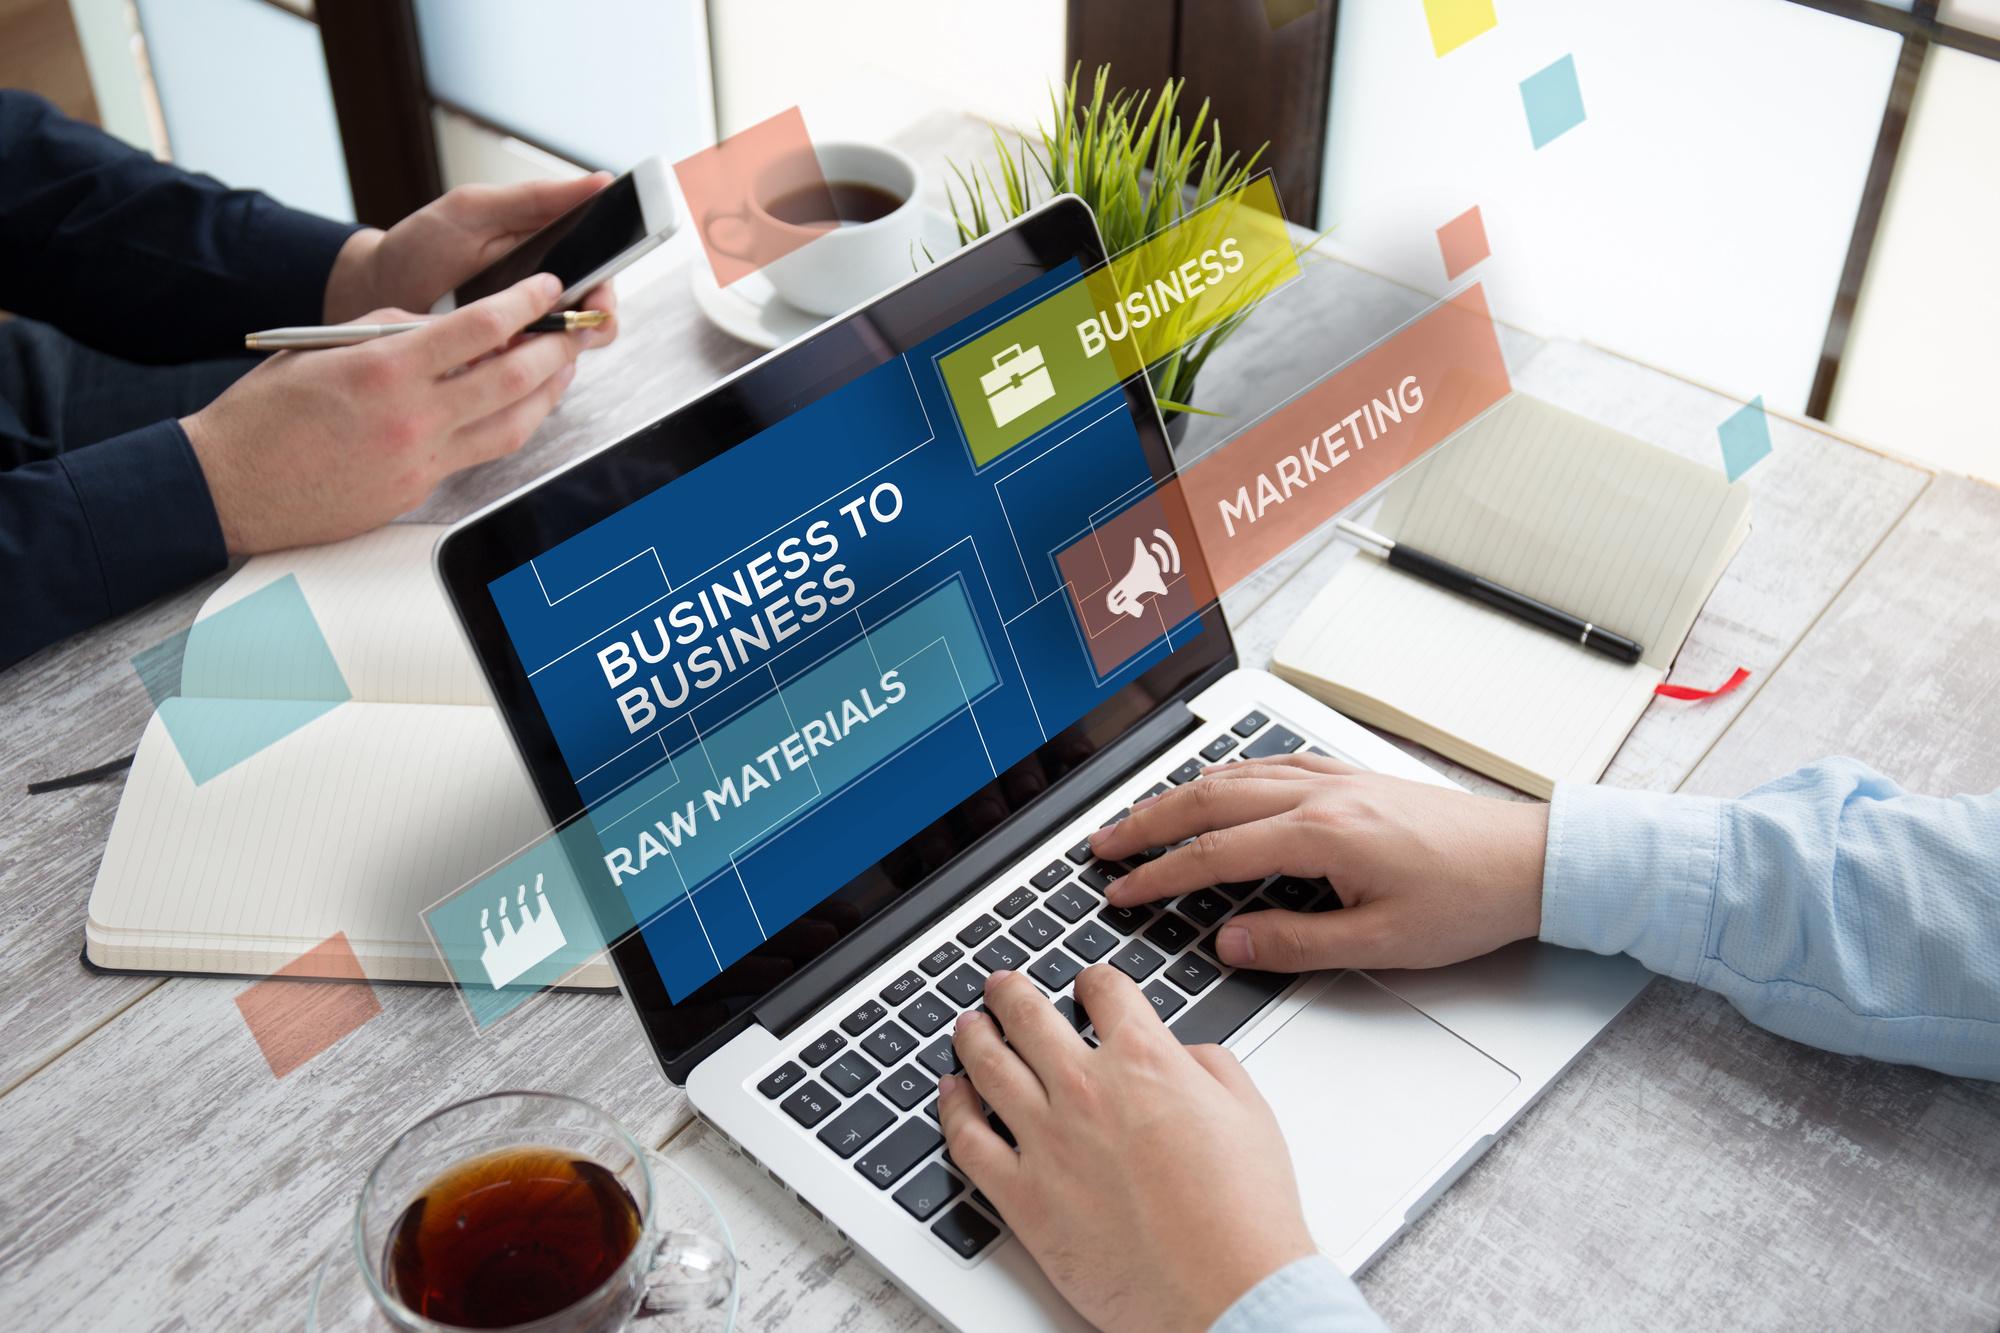 B2B vs B2C: How Digital Marketing Differences Impact Your Web Design